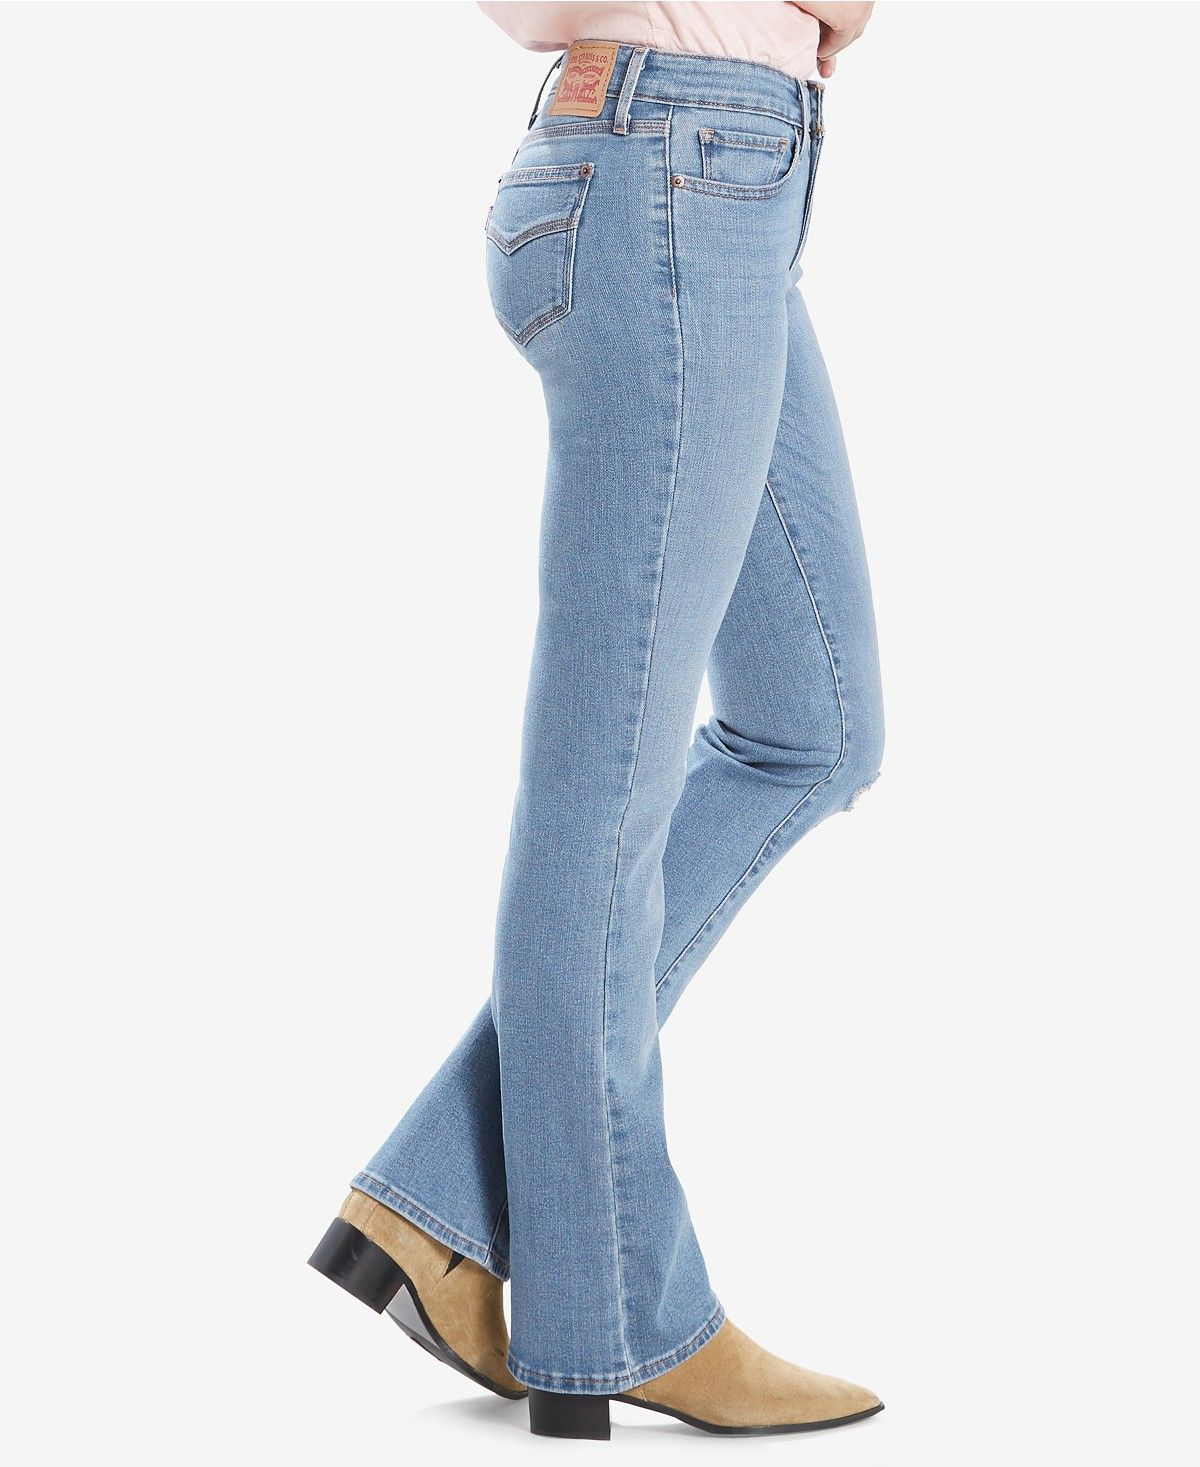 Levi S Women S 715 Bootcut Jeans Reviews Women Macy S Clothes Flattering Fashion Stylish Tops